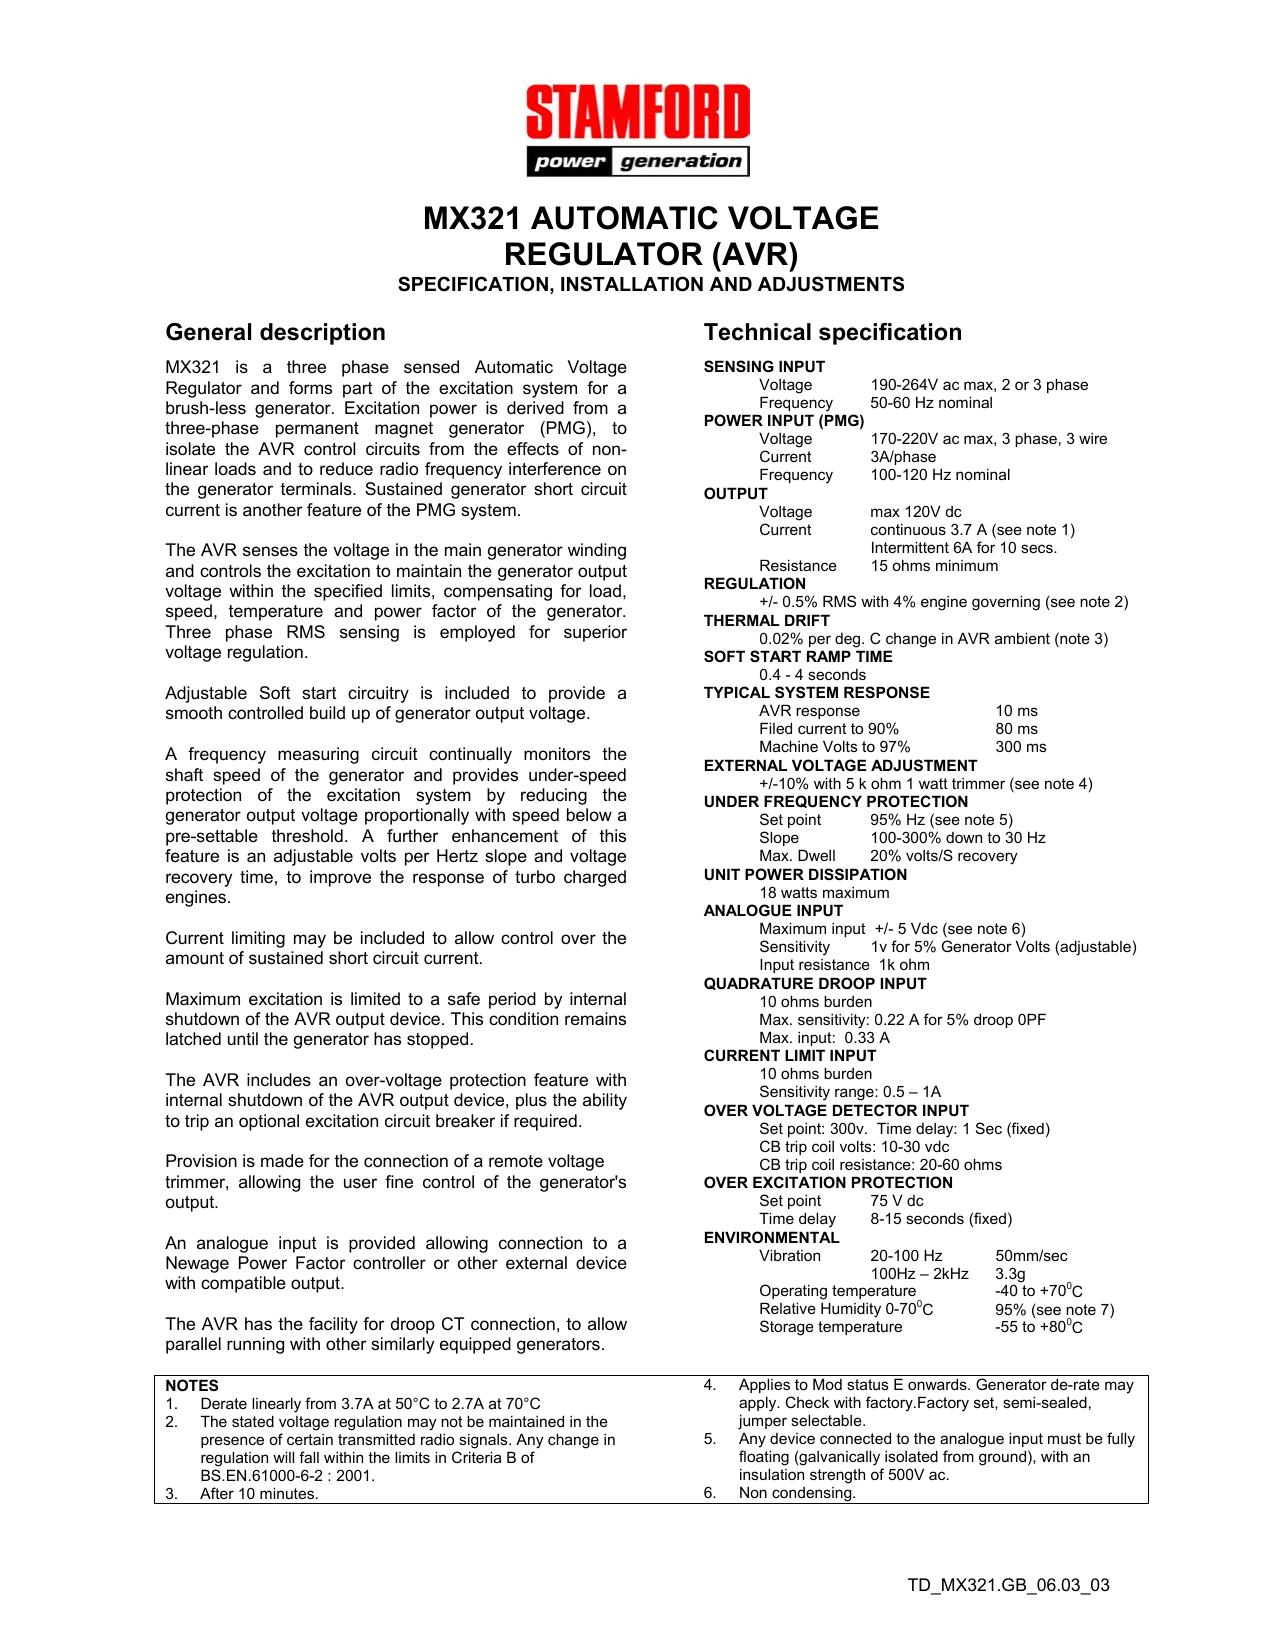 Mx321 Voltage Regulator Wiring Diagram Trusted Schematics Sx460 Automatic Avr Onan Generator